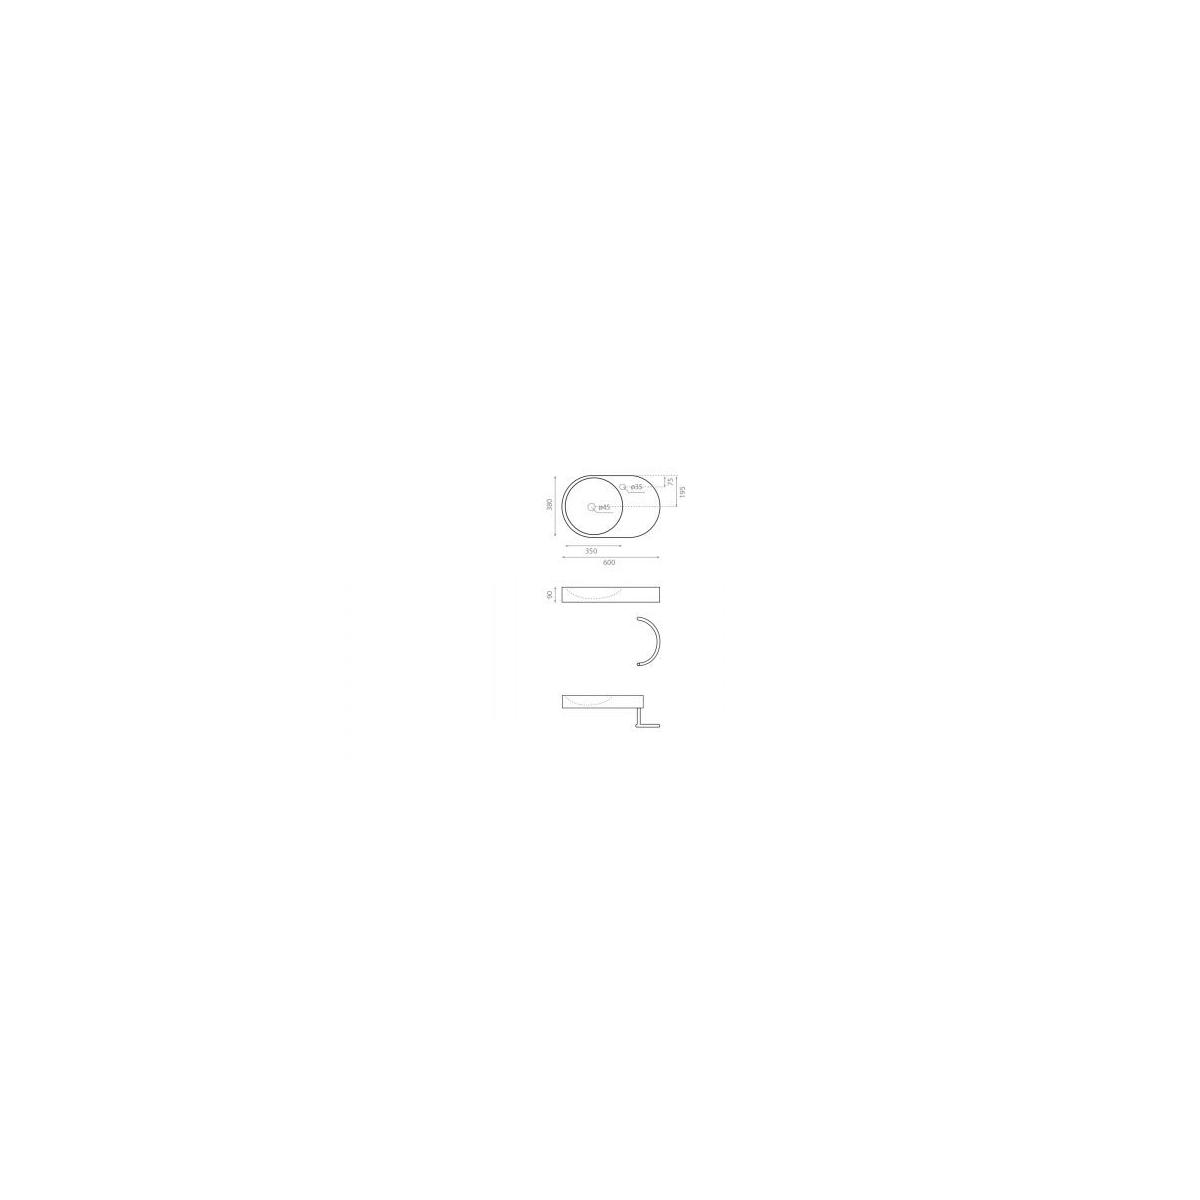 Lavabo Oval Fuengirola - Lavabos ovales - Marca The Bathco